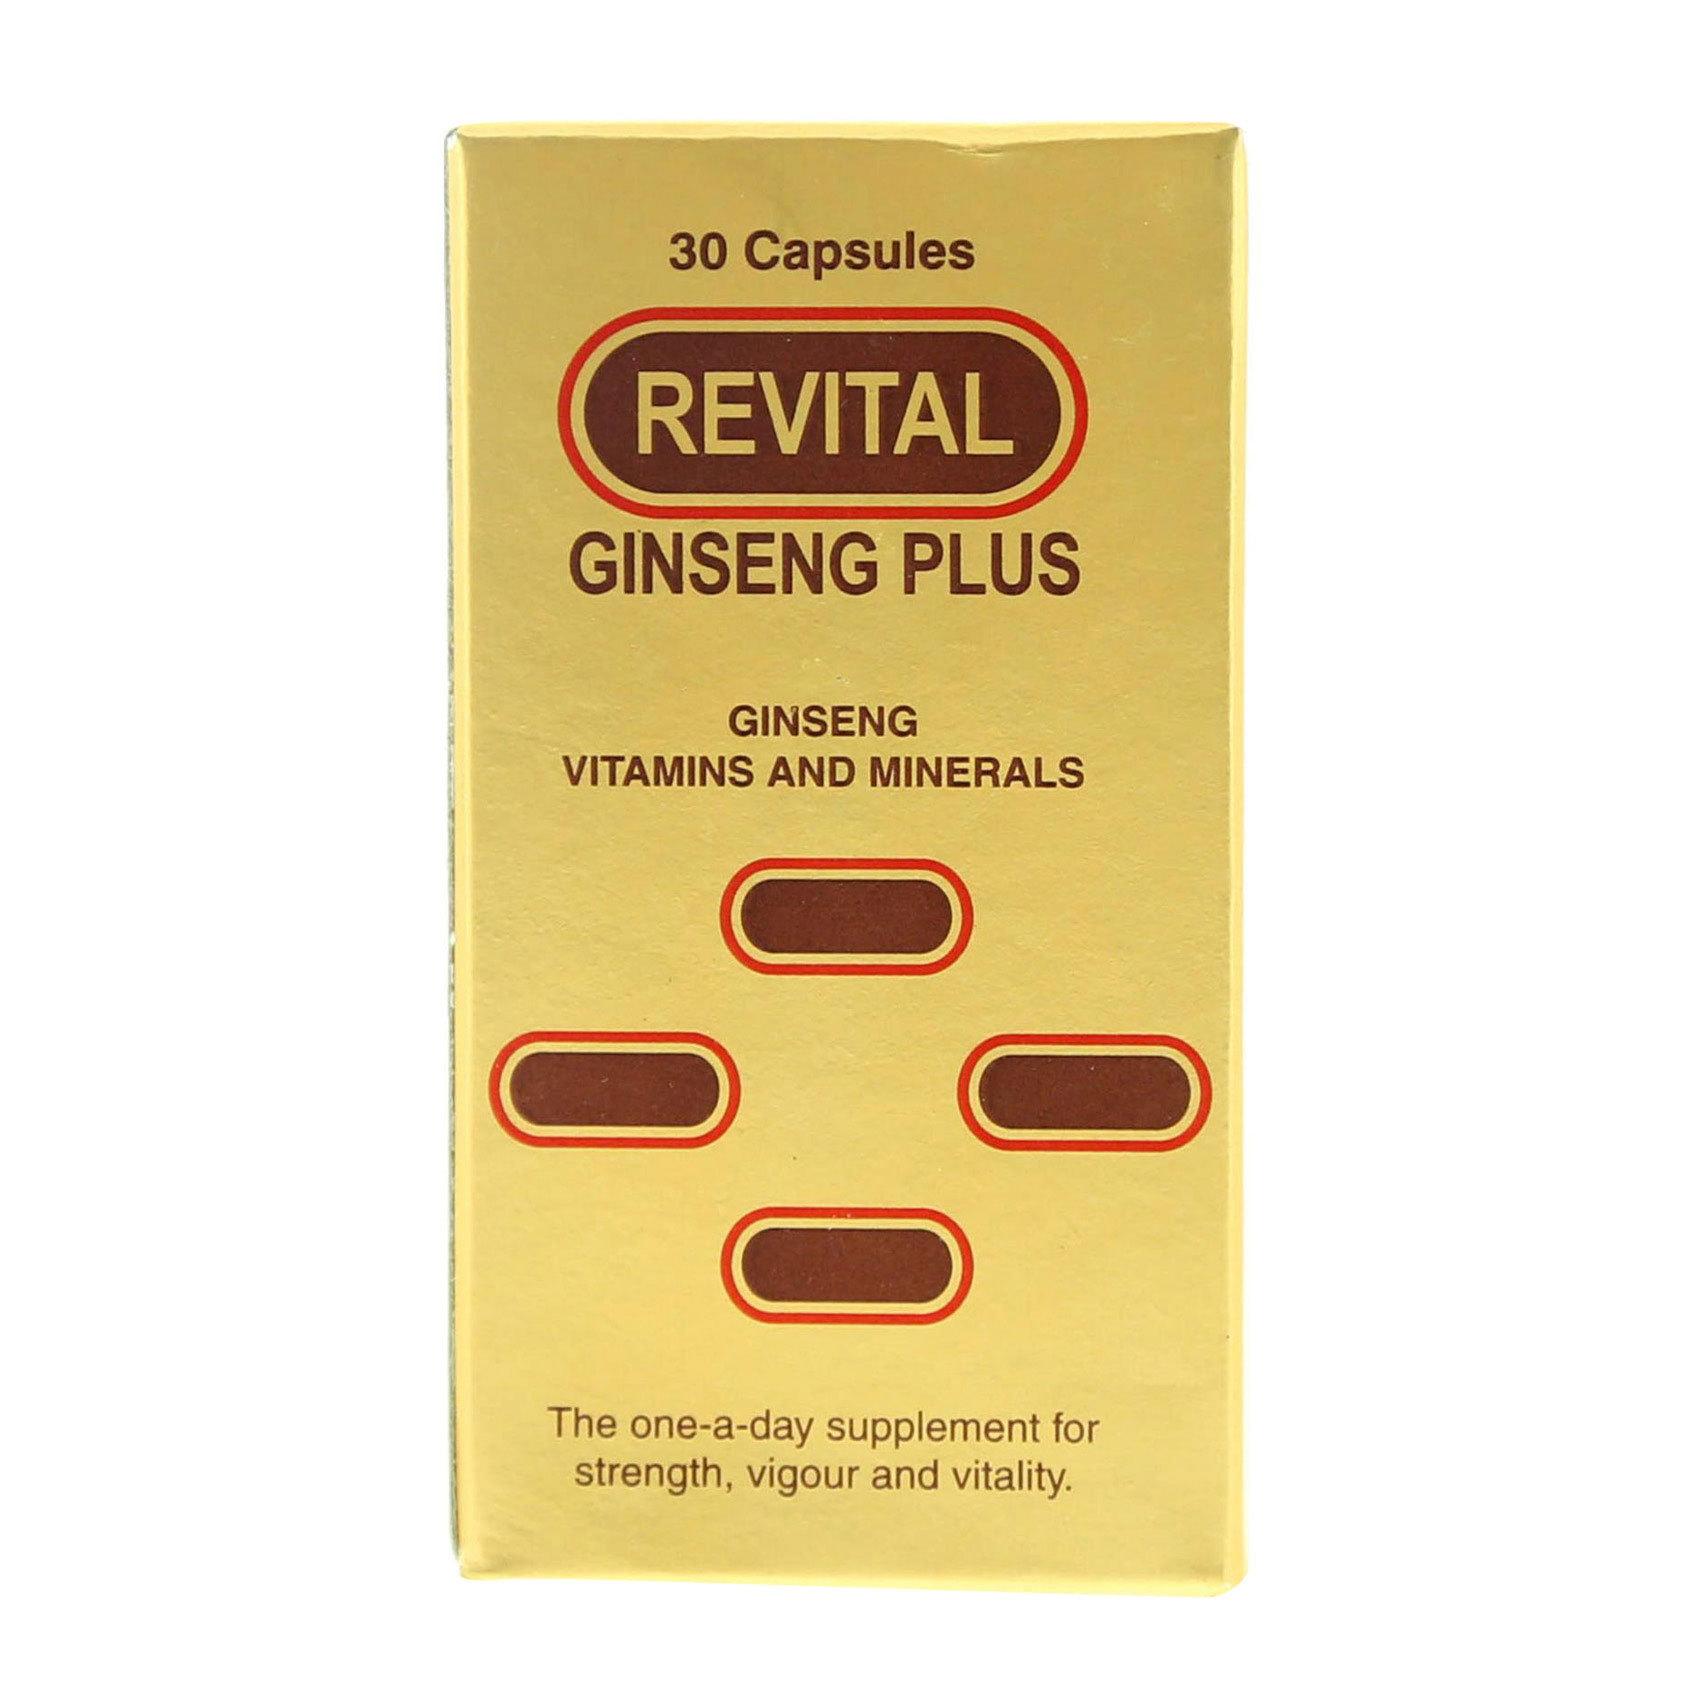 REVITAL GINSENG VIT.&MIN 30 TABLETS